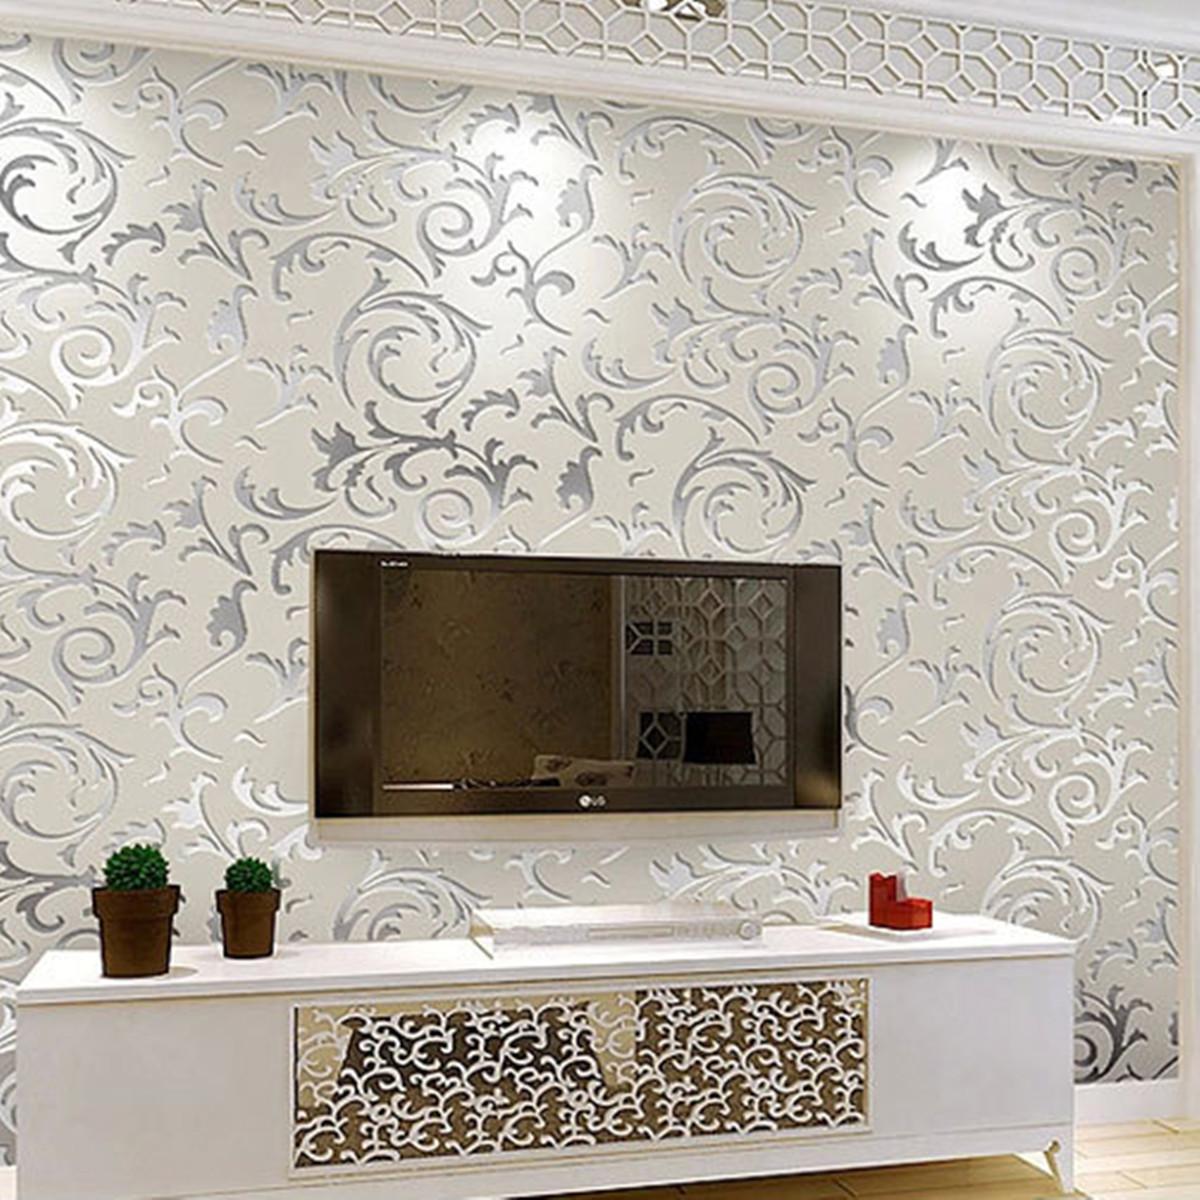 3D Grey World Art Design Map826 Removable Wallpaper Self Adhesive Wallpaper Extra Large Peel /& Stick Wallpaper Wallpaper Mural AJ WALLPAPERS